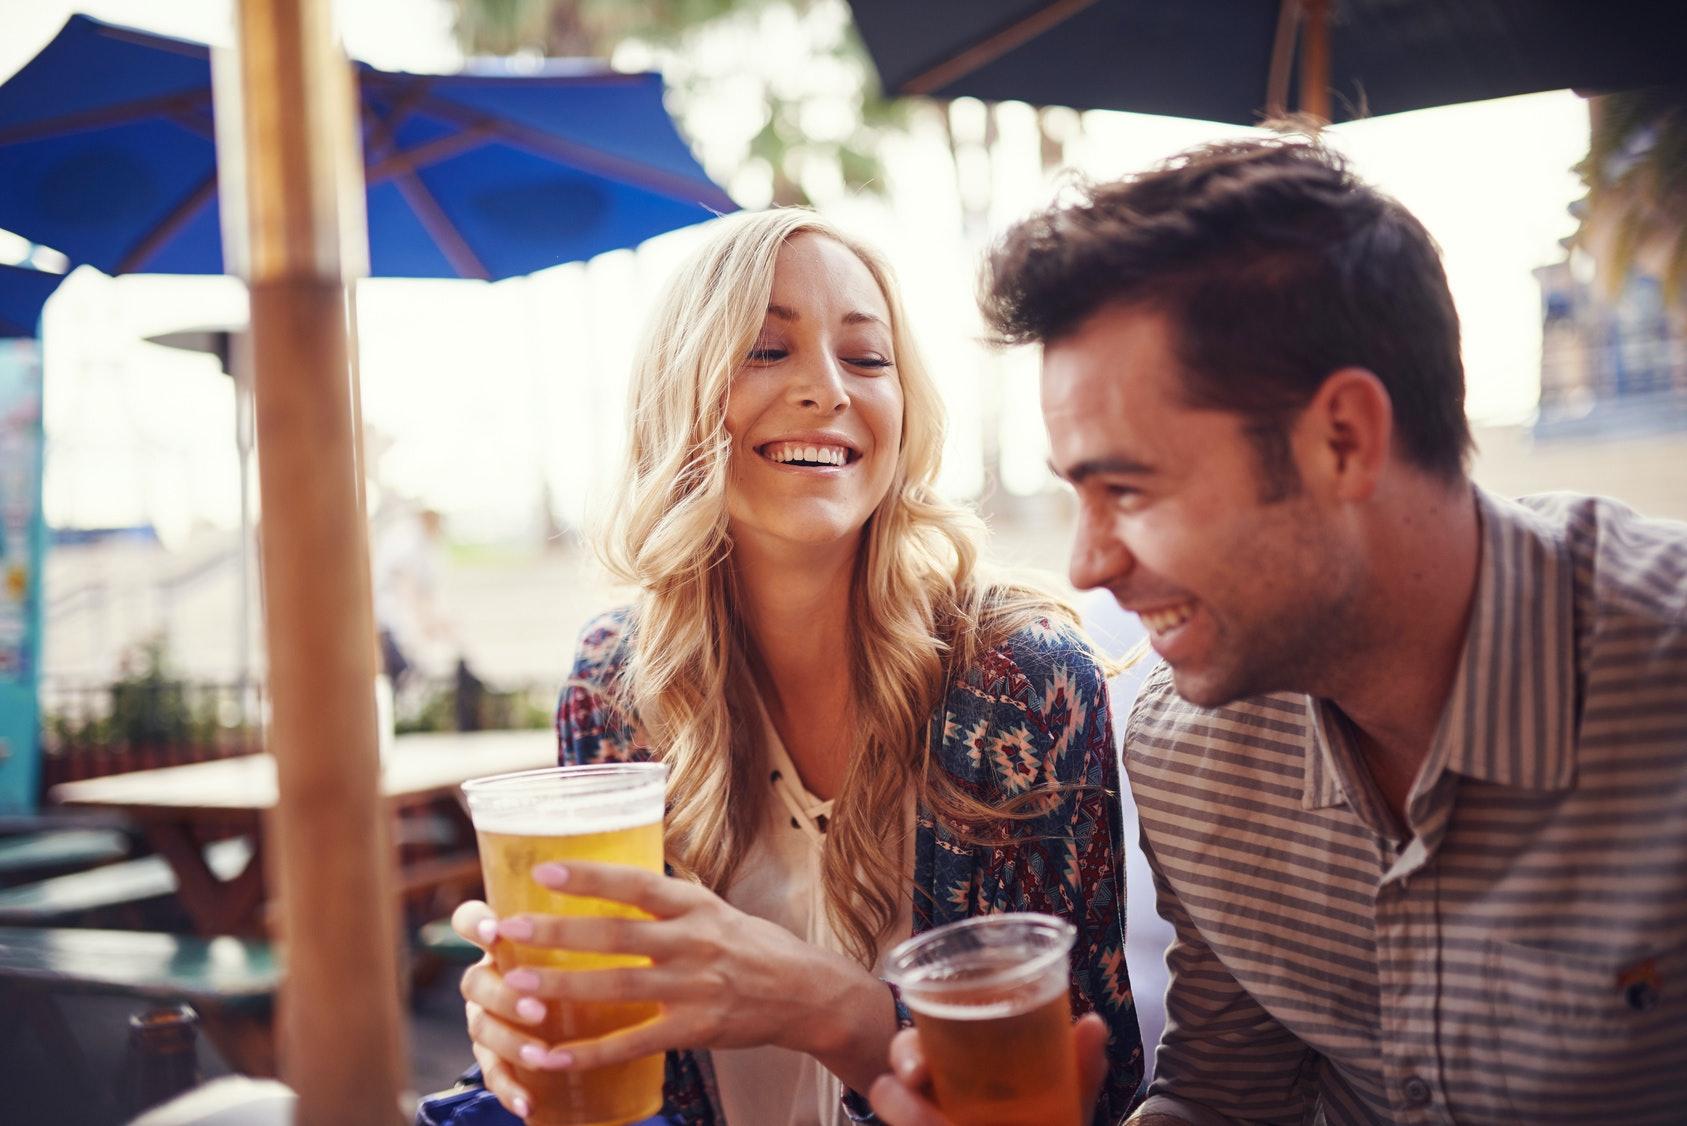 3 ways smart women rebound after relationship ends